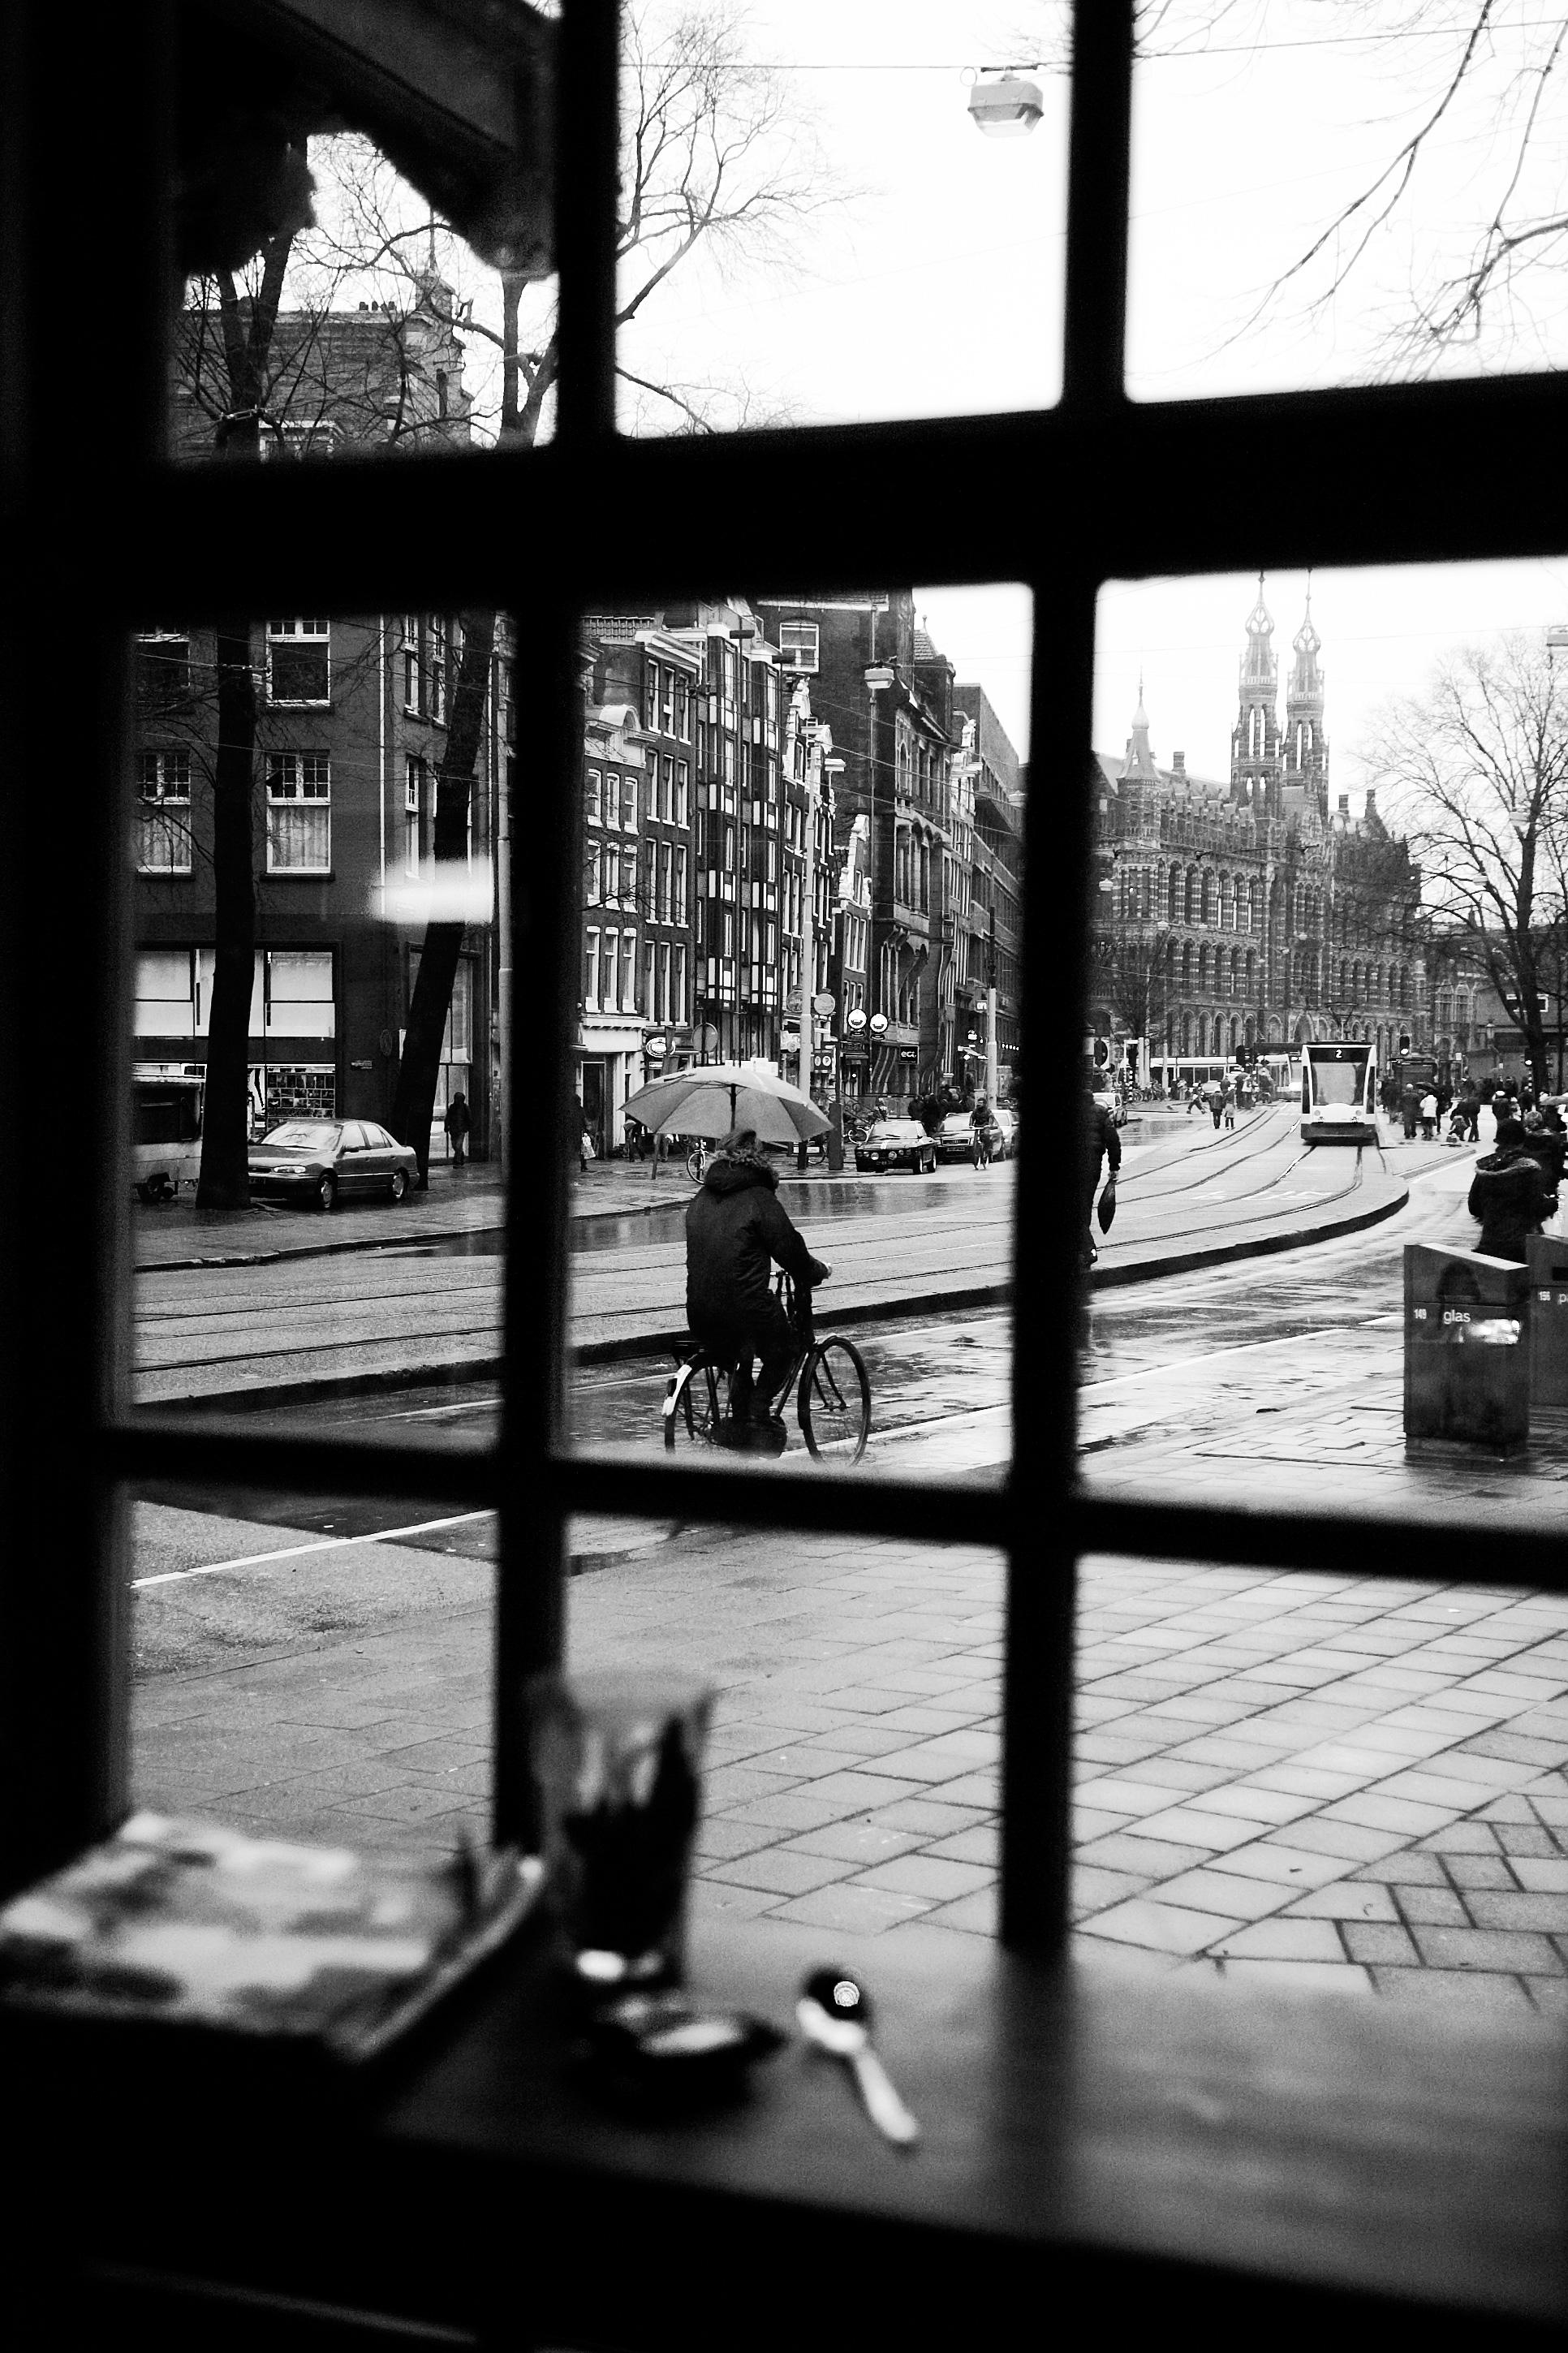 Saturday Afternoon, Amsterdam